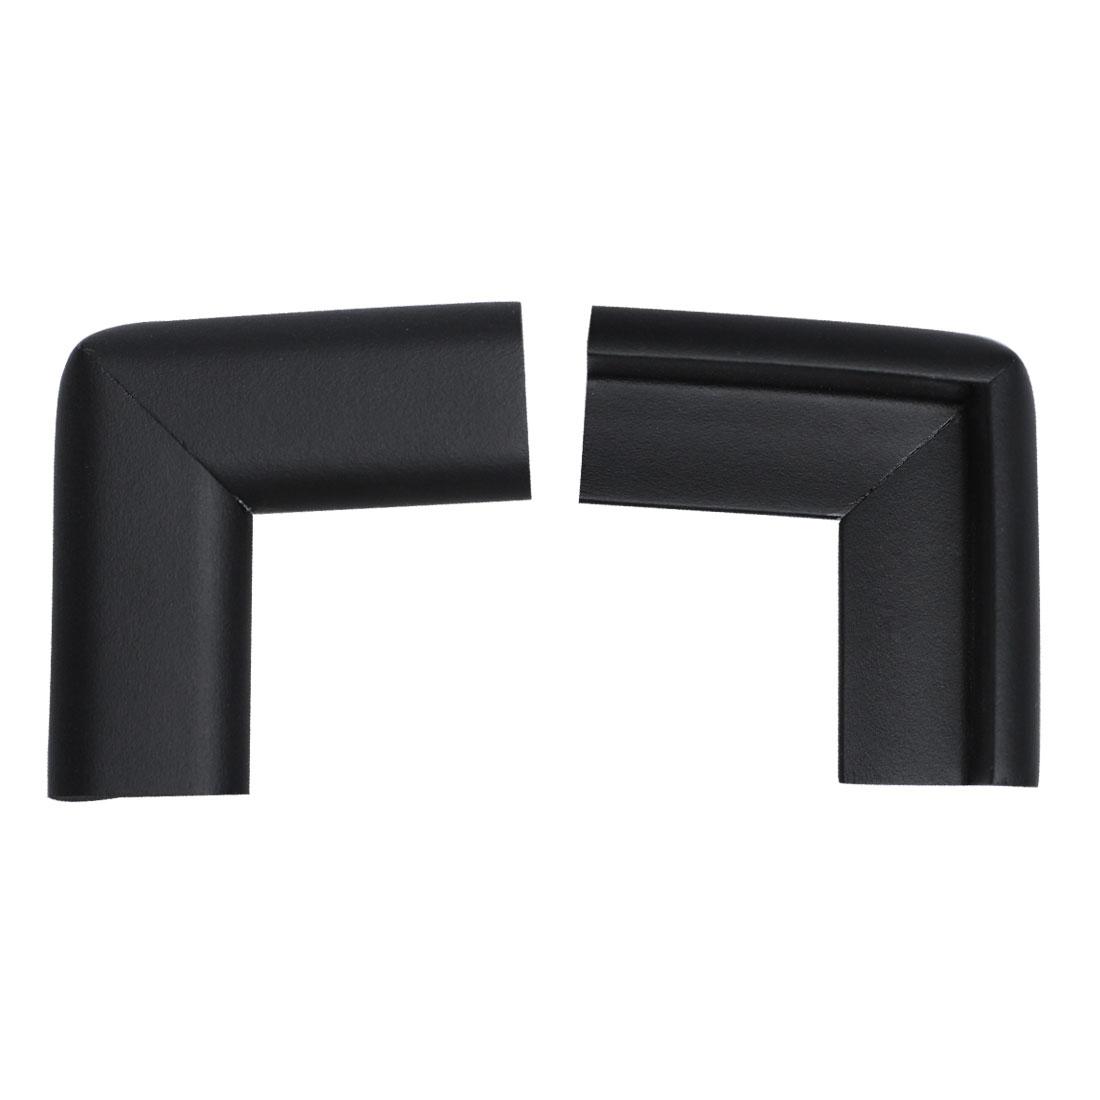 Desk Table Edge Foam Corner Cushion Guard Soft Bumper Protector 2pcs Black